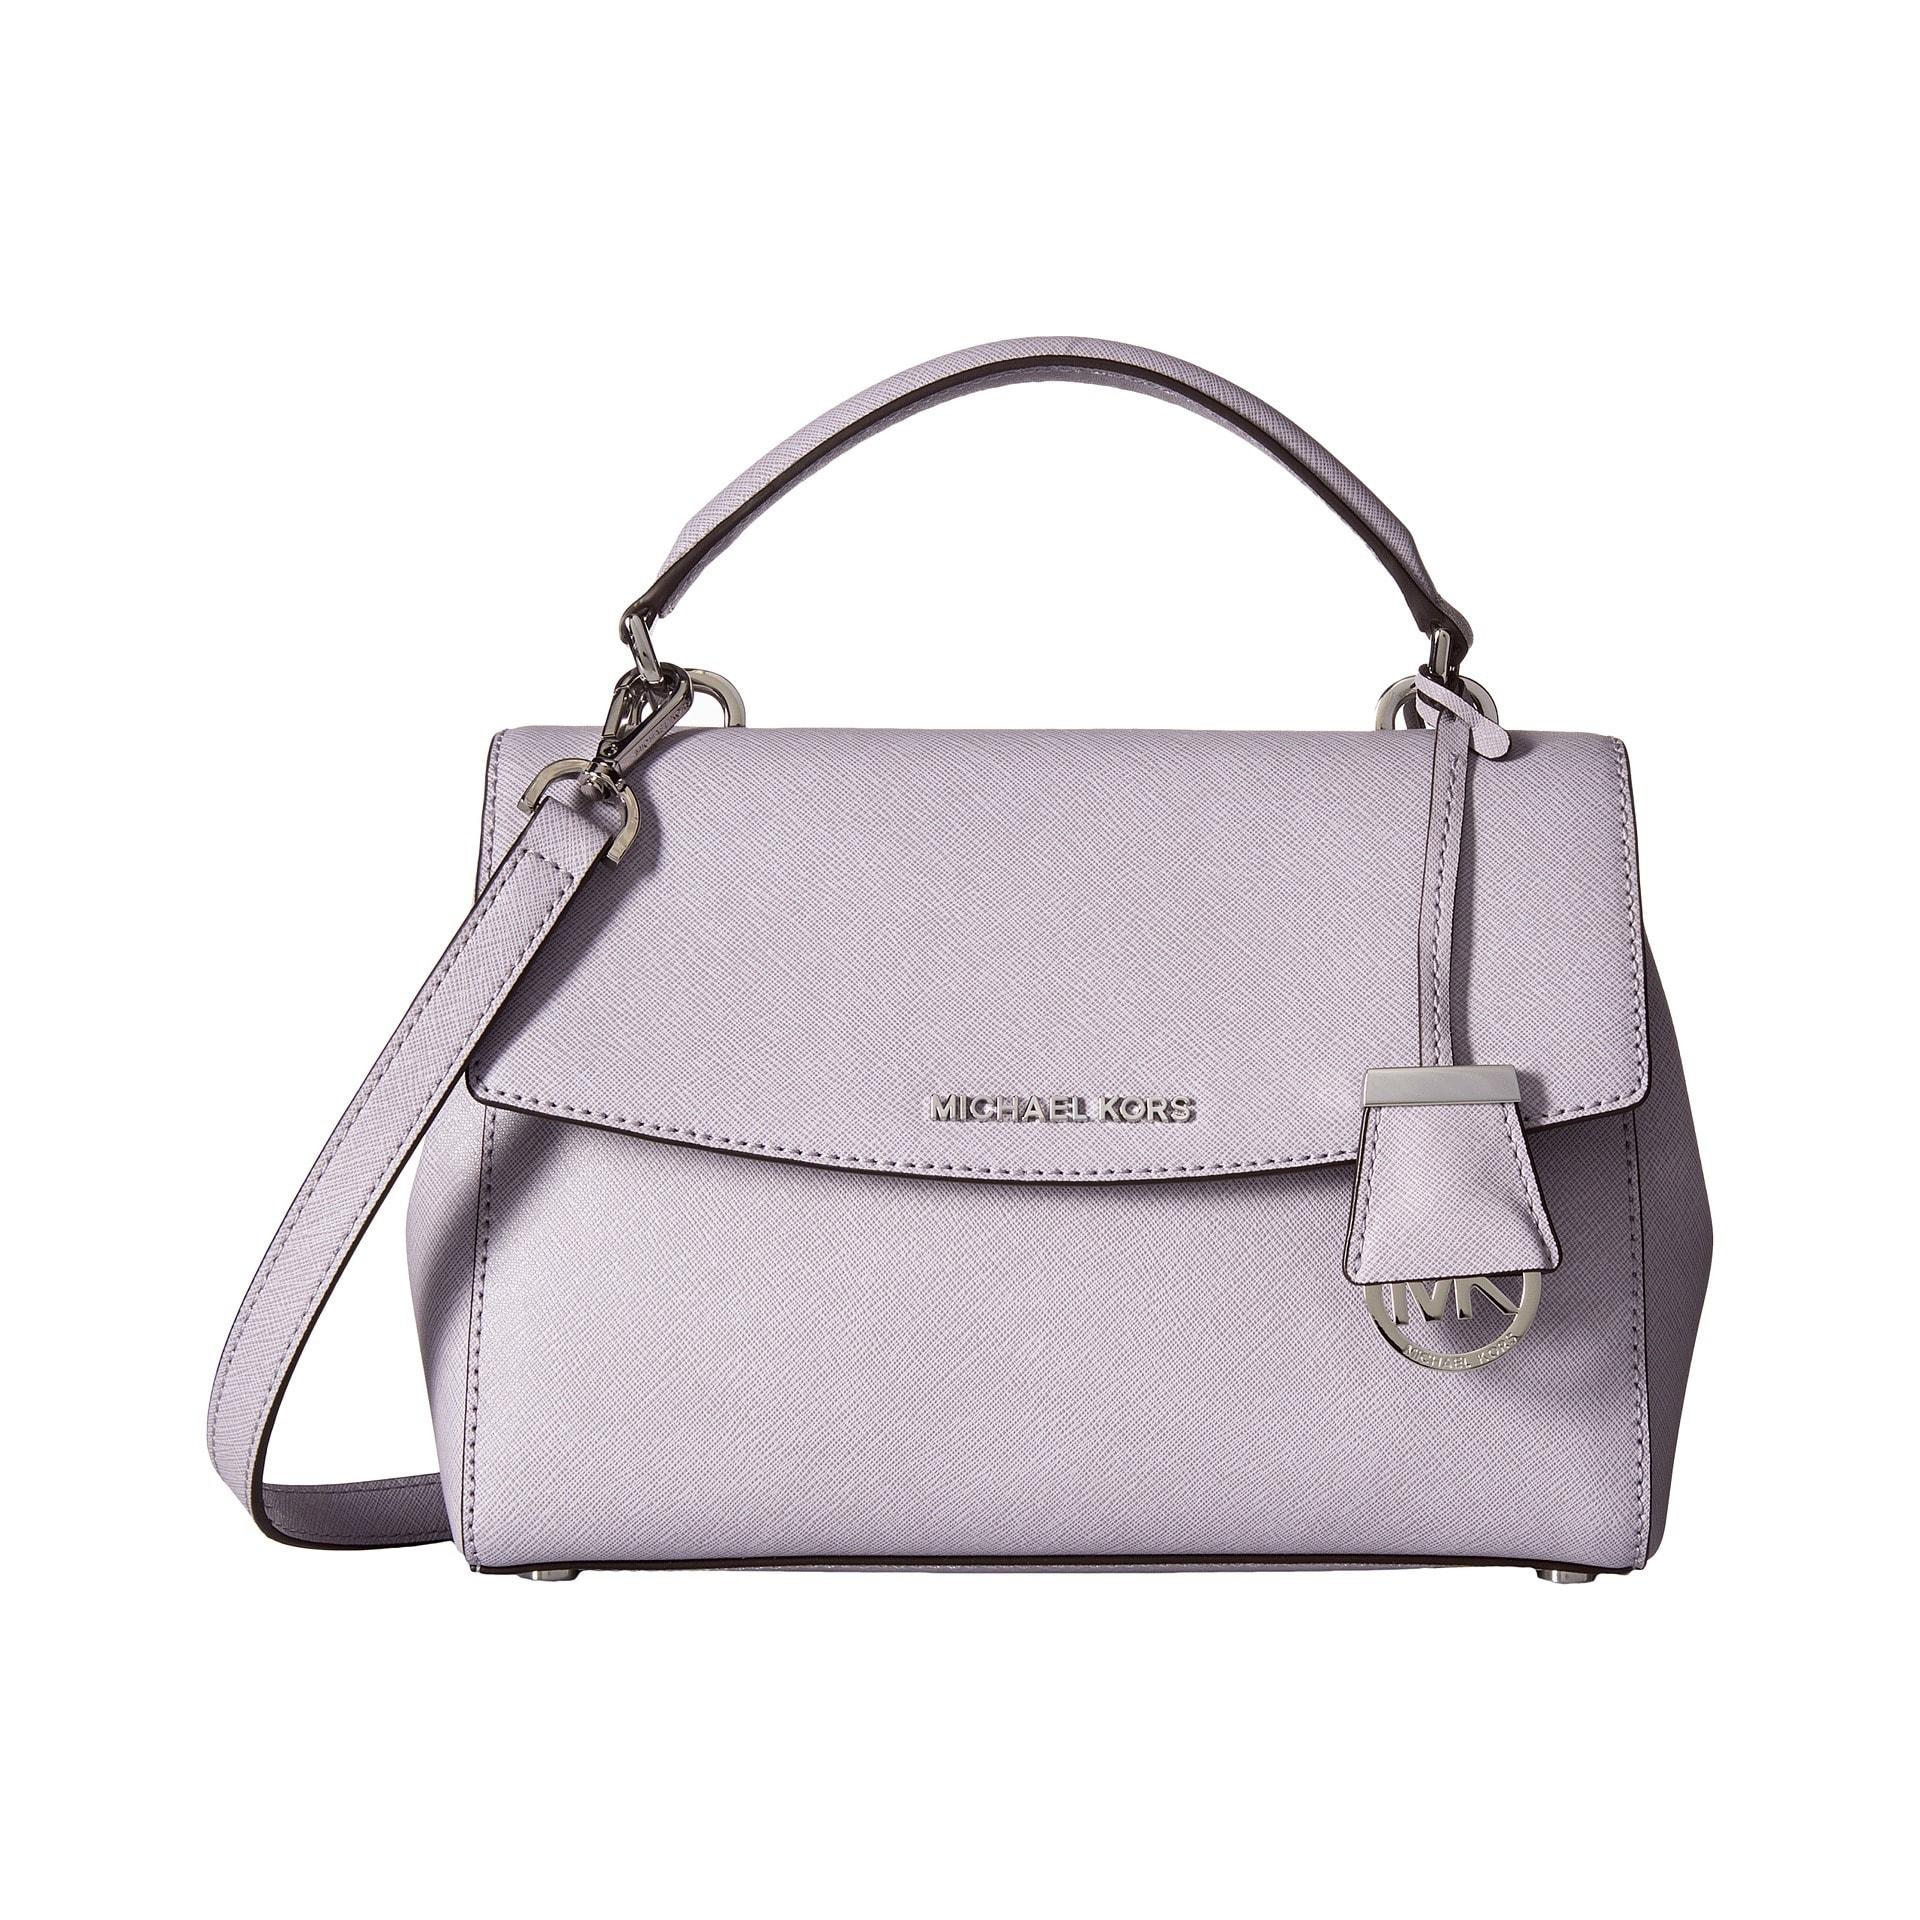 b8840627d65c Shop Michael Kors Ava Lilac Small Top Handle Satchel Handbag - Free  Shipping Today - Overstock - 11403800